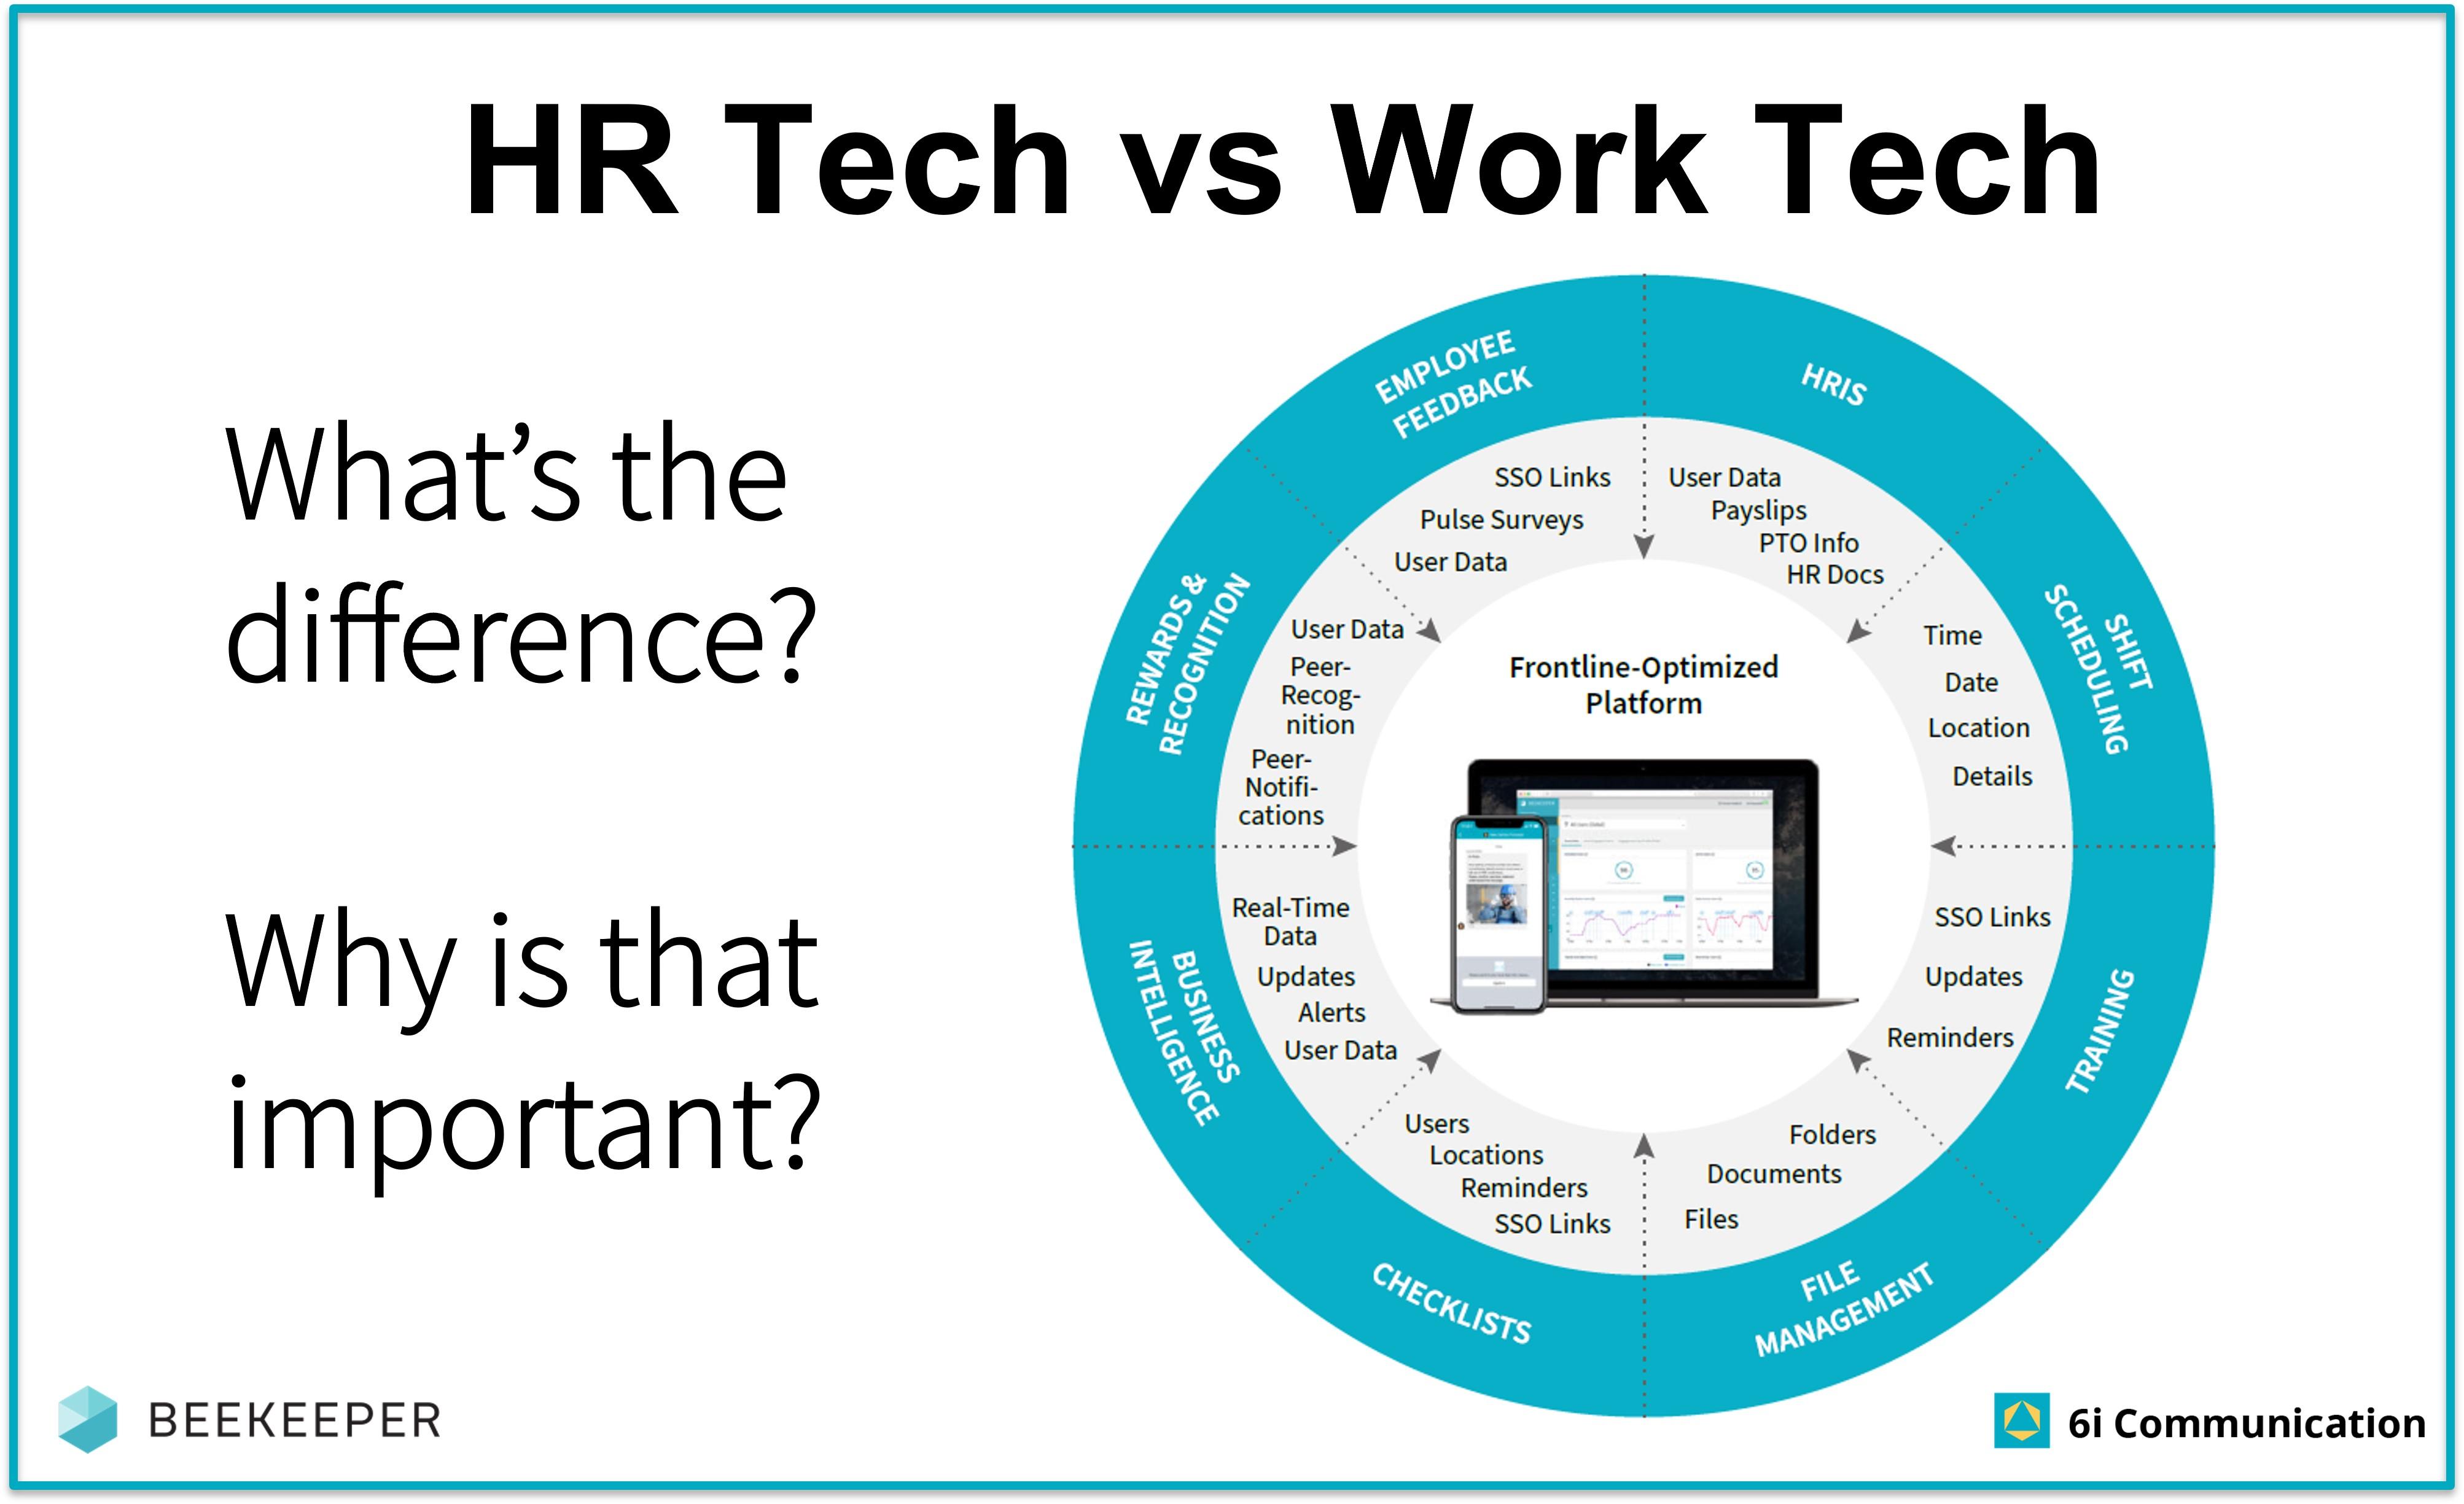 Work Tech vs HR Tech Published 29Jul21